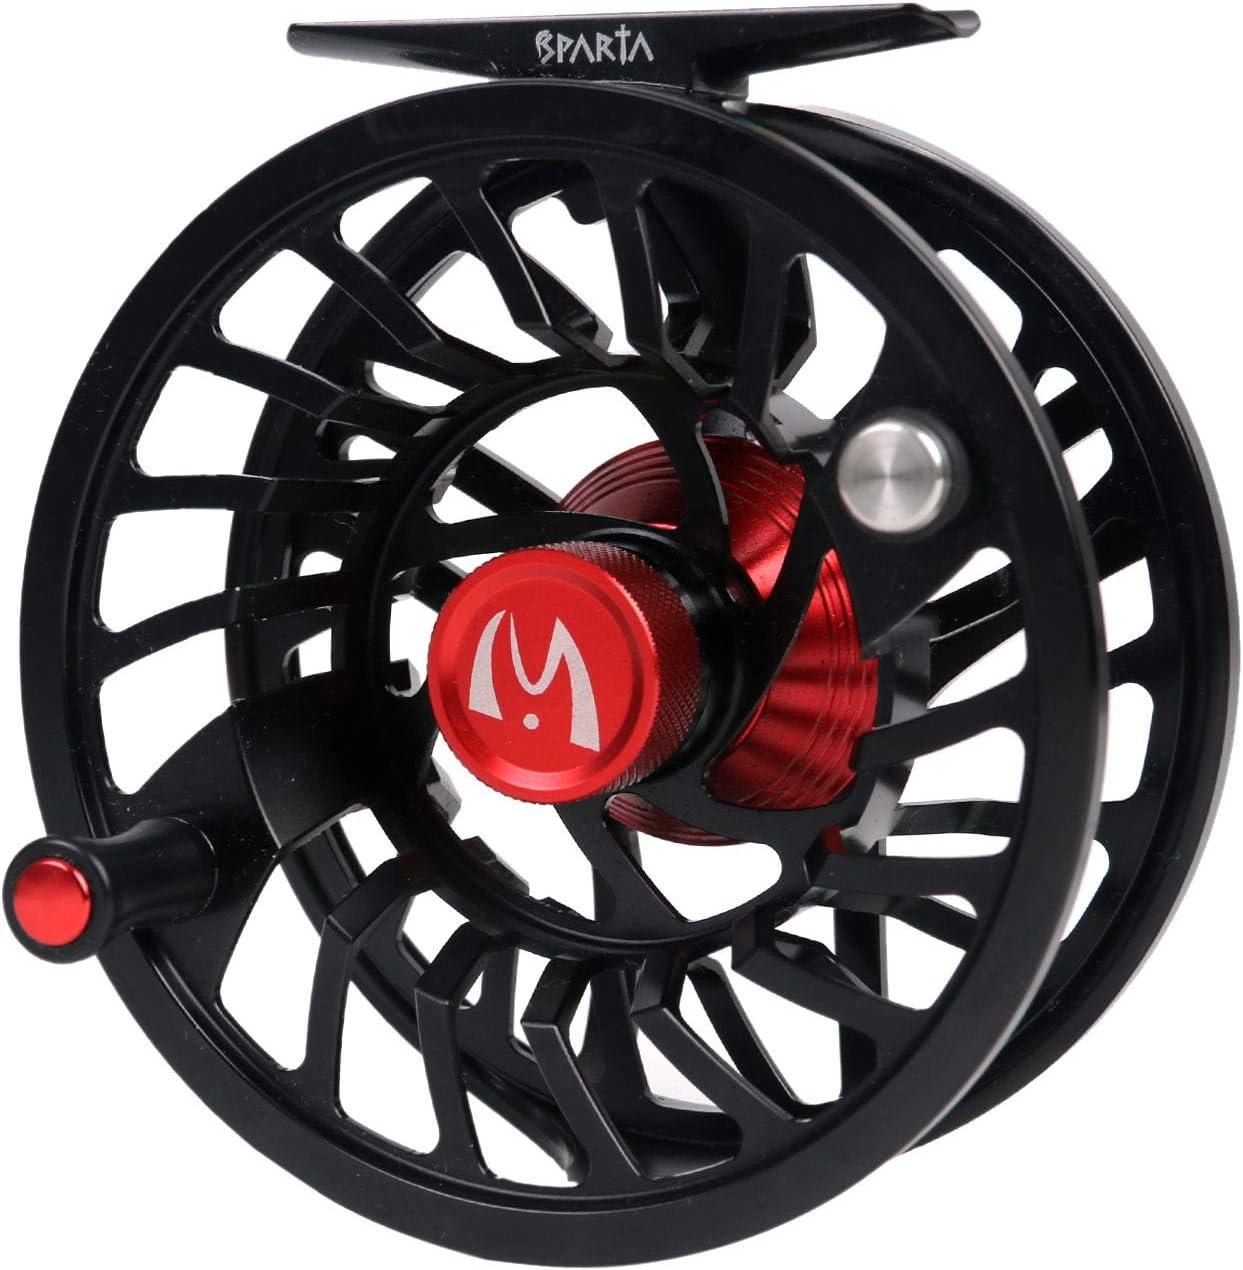 Amazon Com M Maximumcatch Maxcatch Sparta Fly Reel Fully Sealed Lightweight Expert Fly Fishing Reel 3 5wt 5 7wt 7 9wt 8 10wt Sports Outdoors